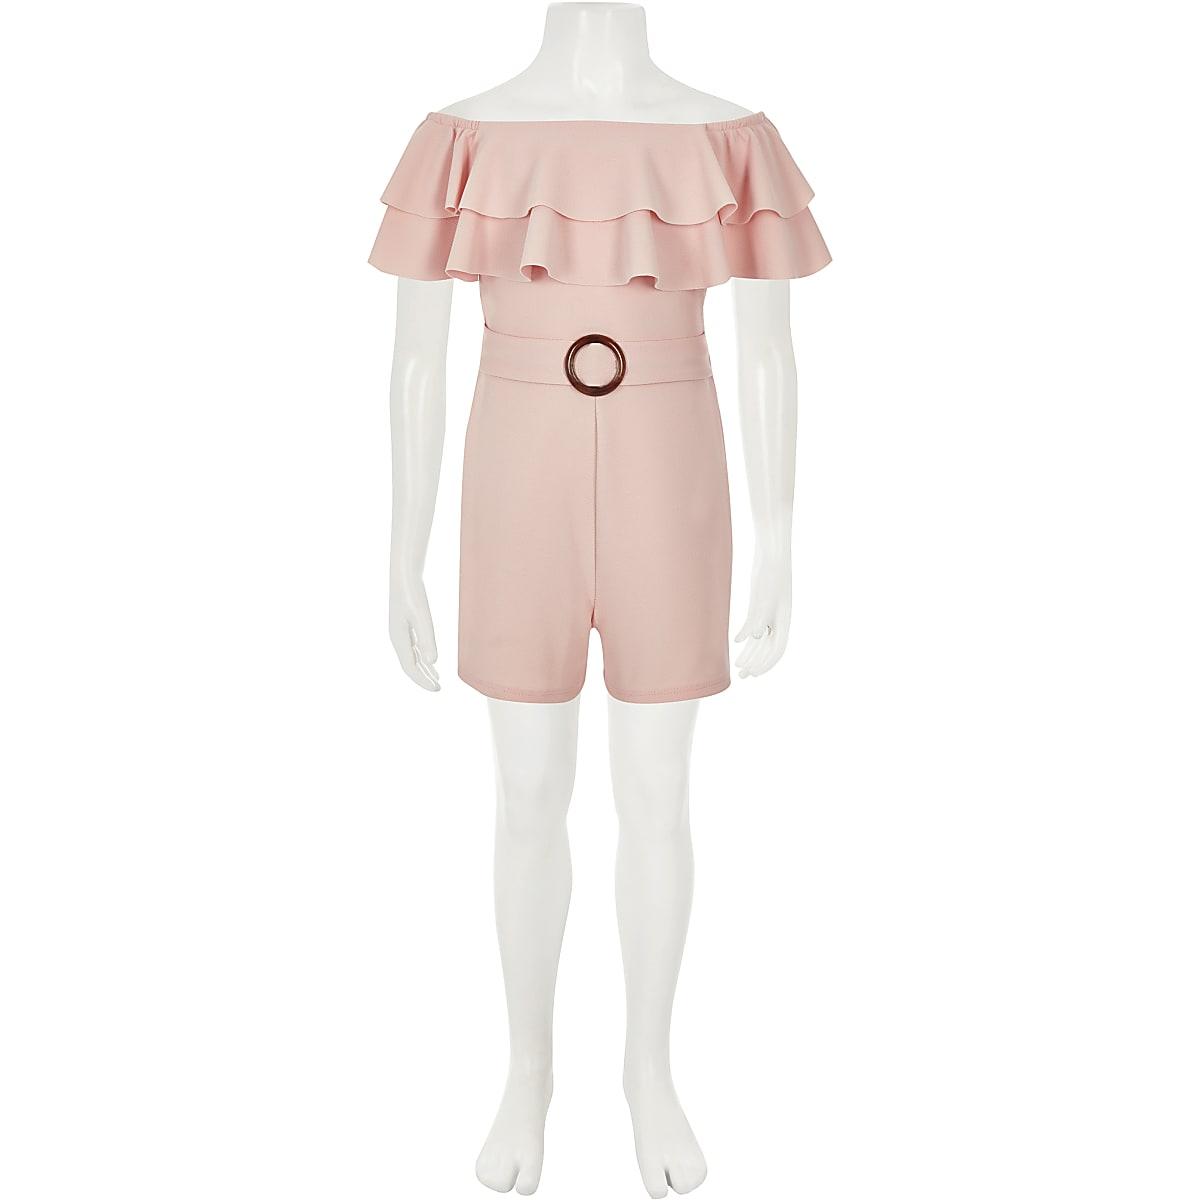 8616930fd1 Girls light pink bardot frill playsuit - Playsuits - Playsuits ...